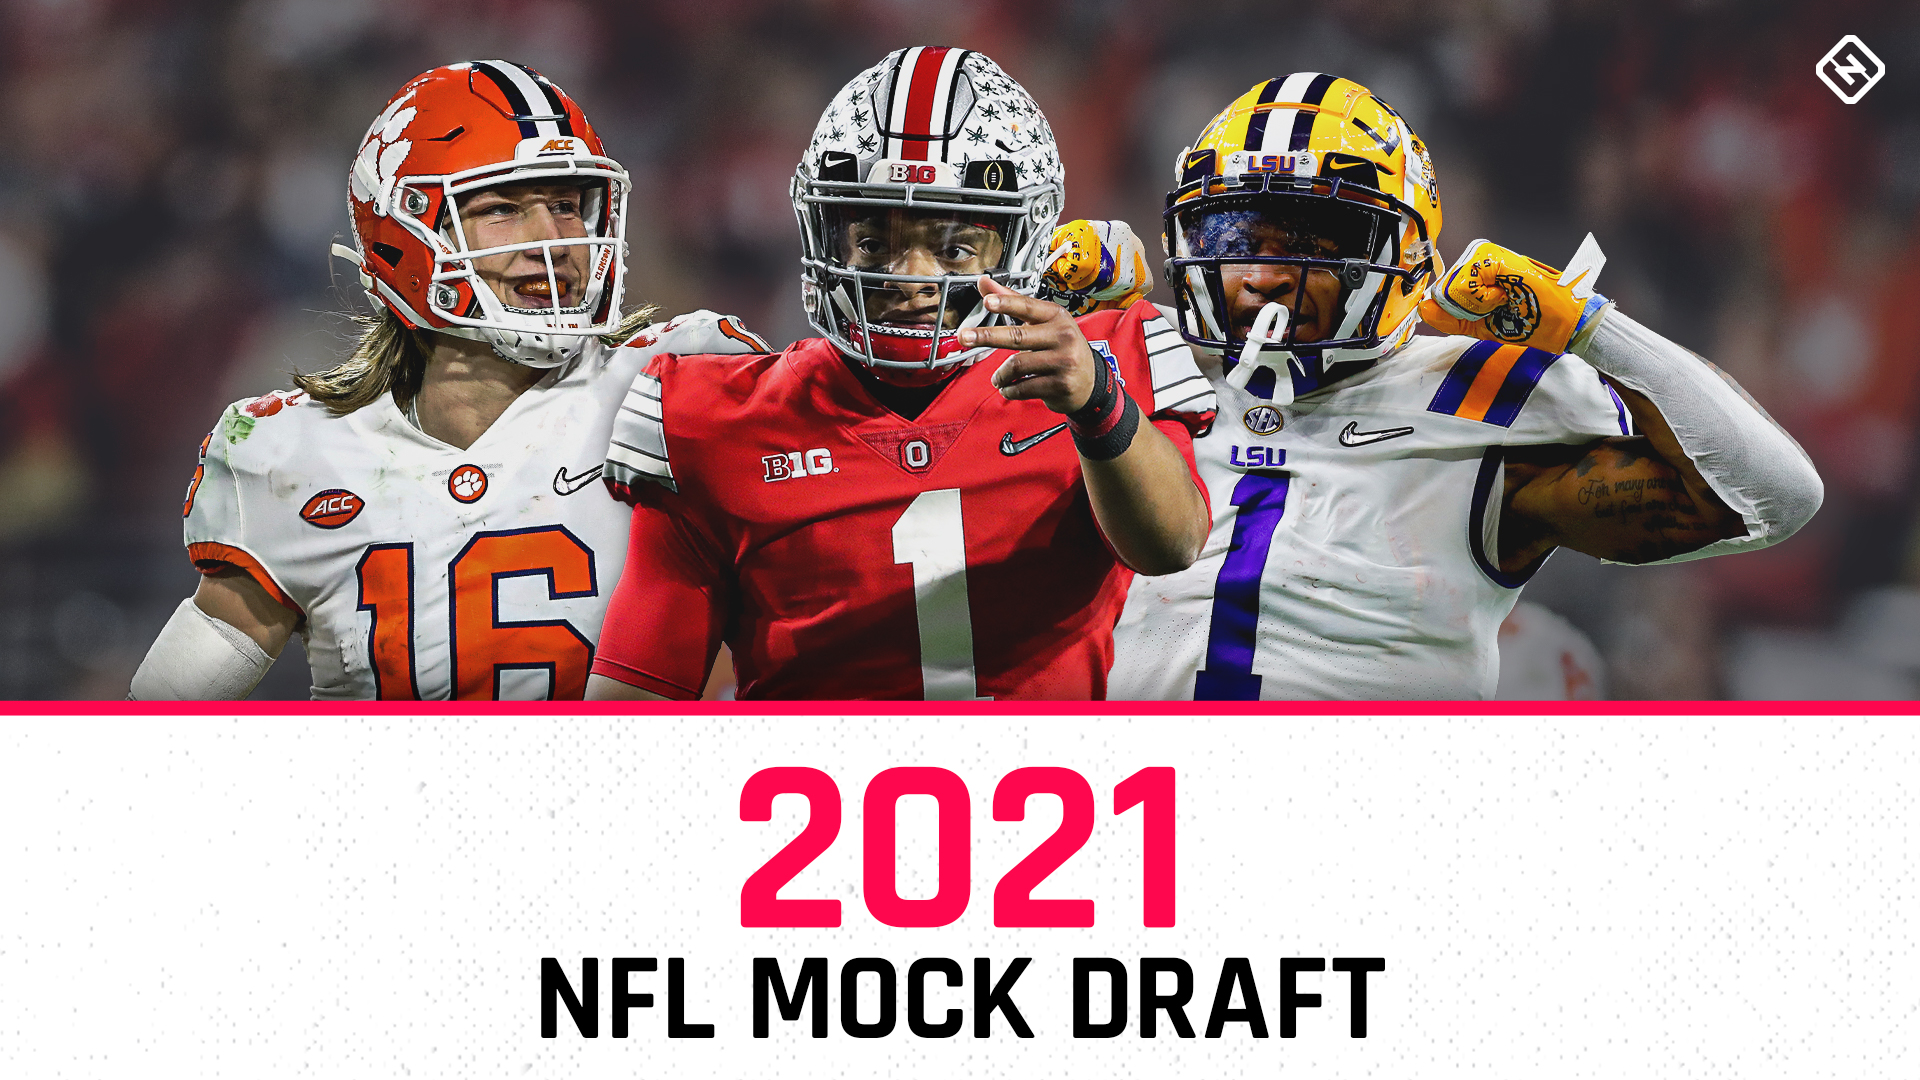 Mock Draft 2021 Nfl